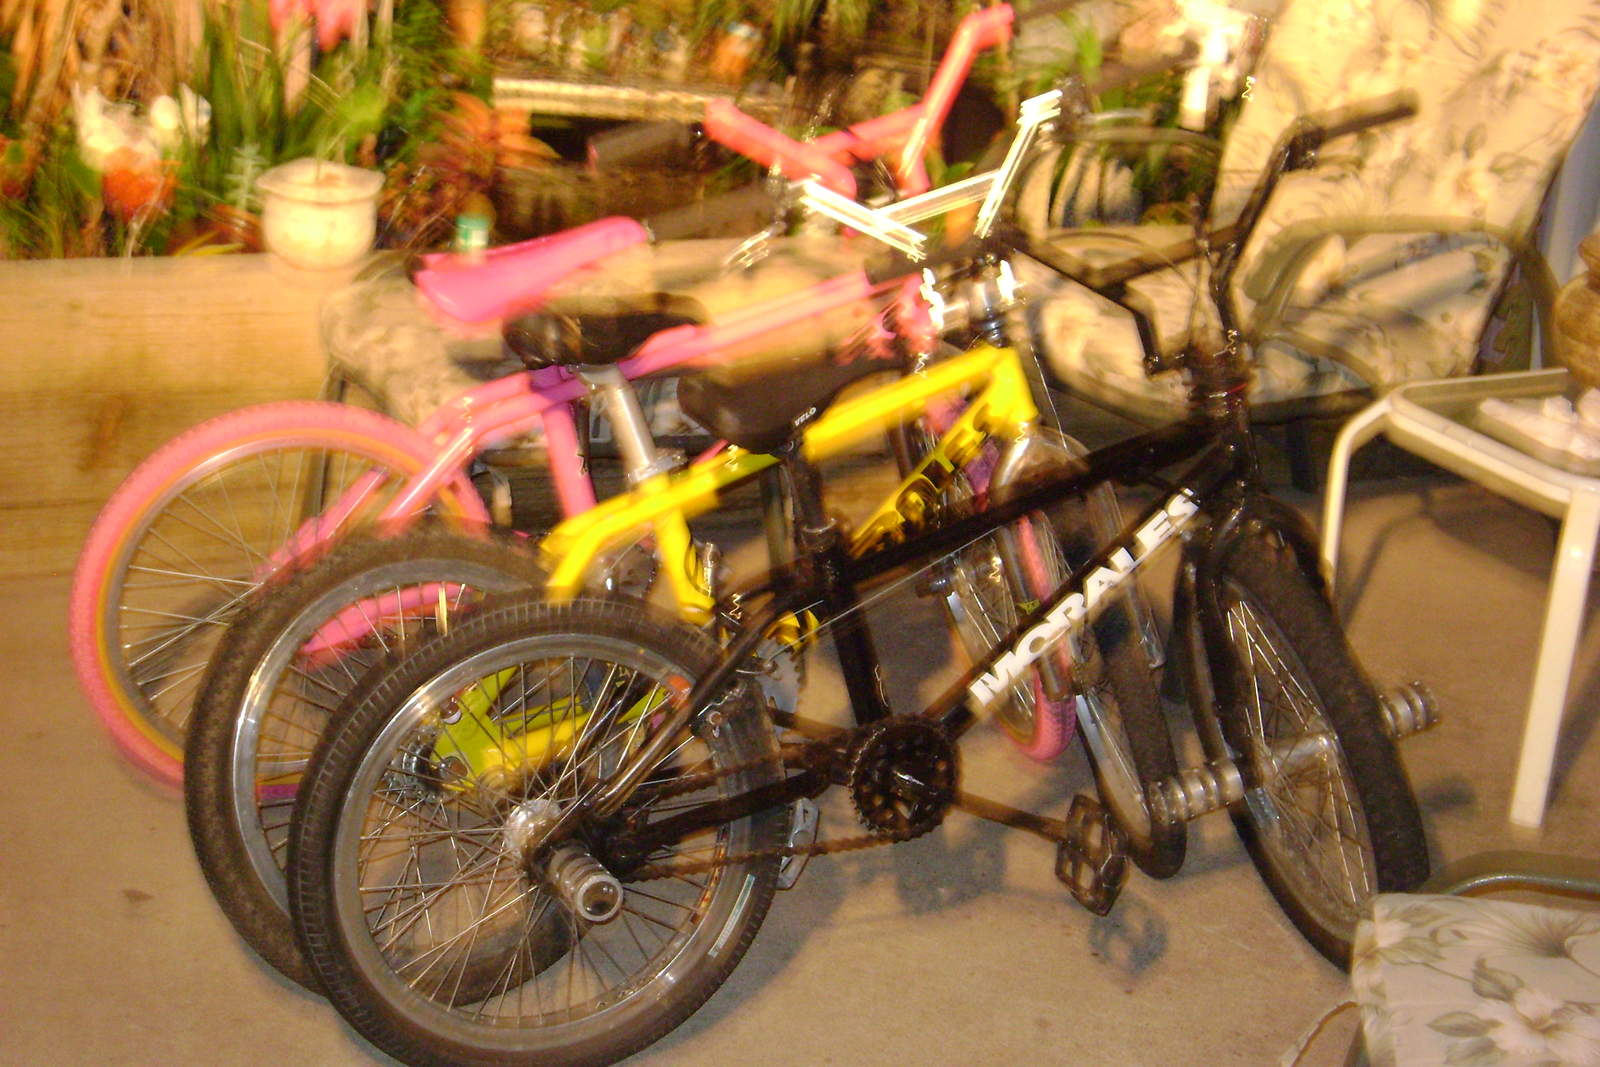 https://s3.amazonaws.com/uploads.bmxmuseum.com/user-images/6905/bikes-freestyle-0215968fa8c00.jpg